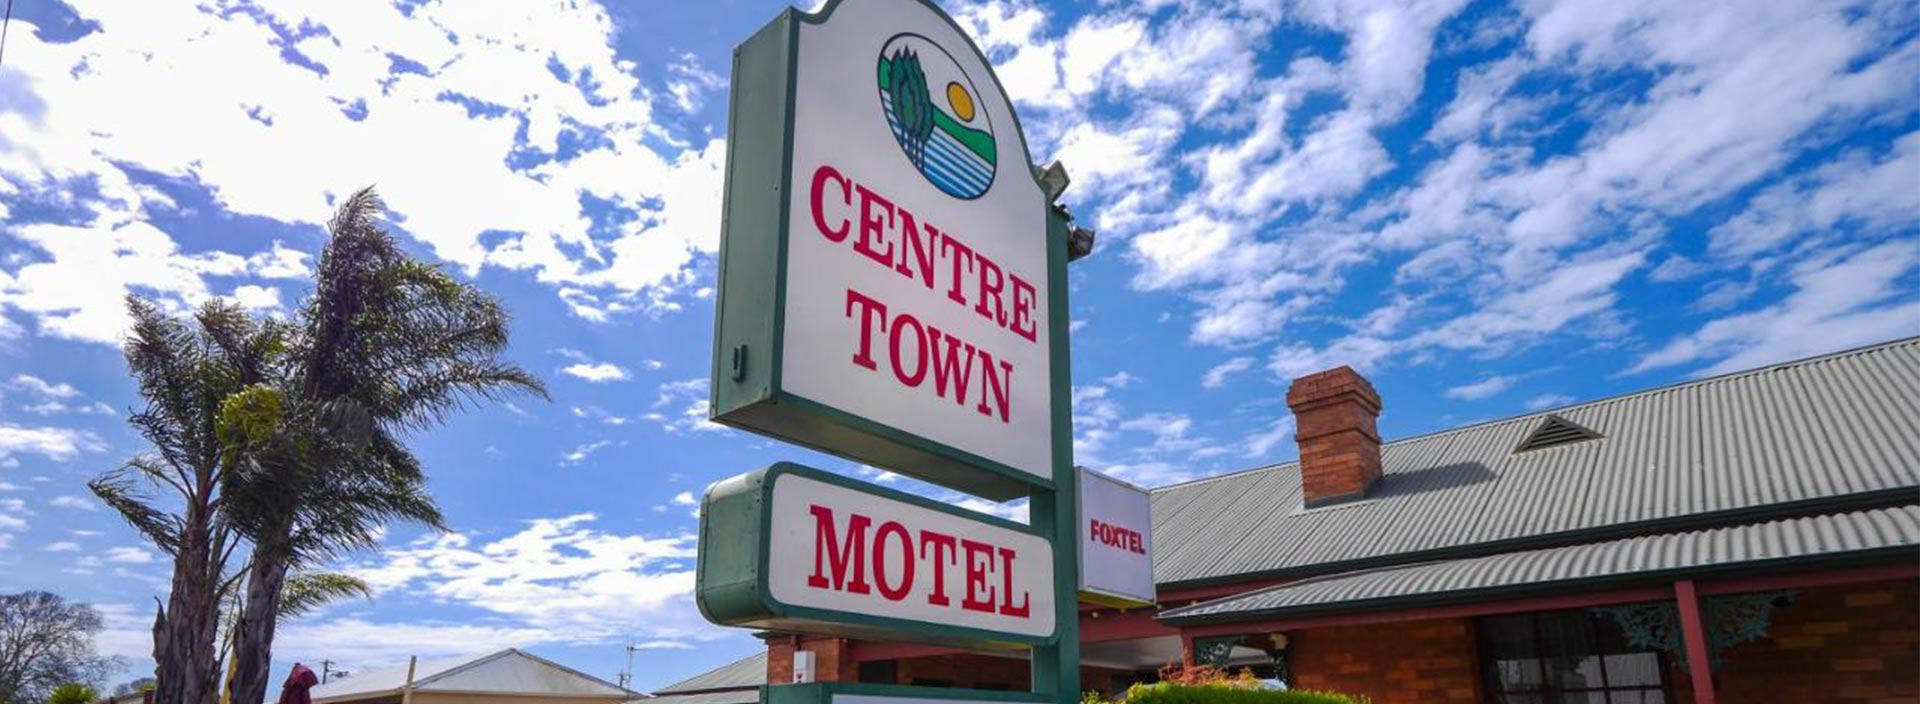 Centretown Motel Nagambie